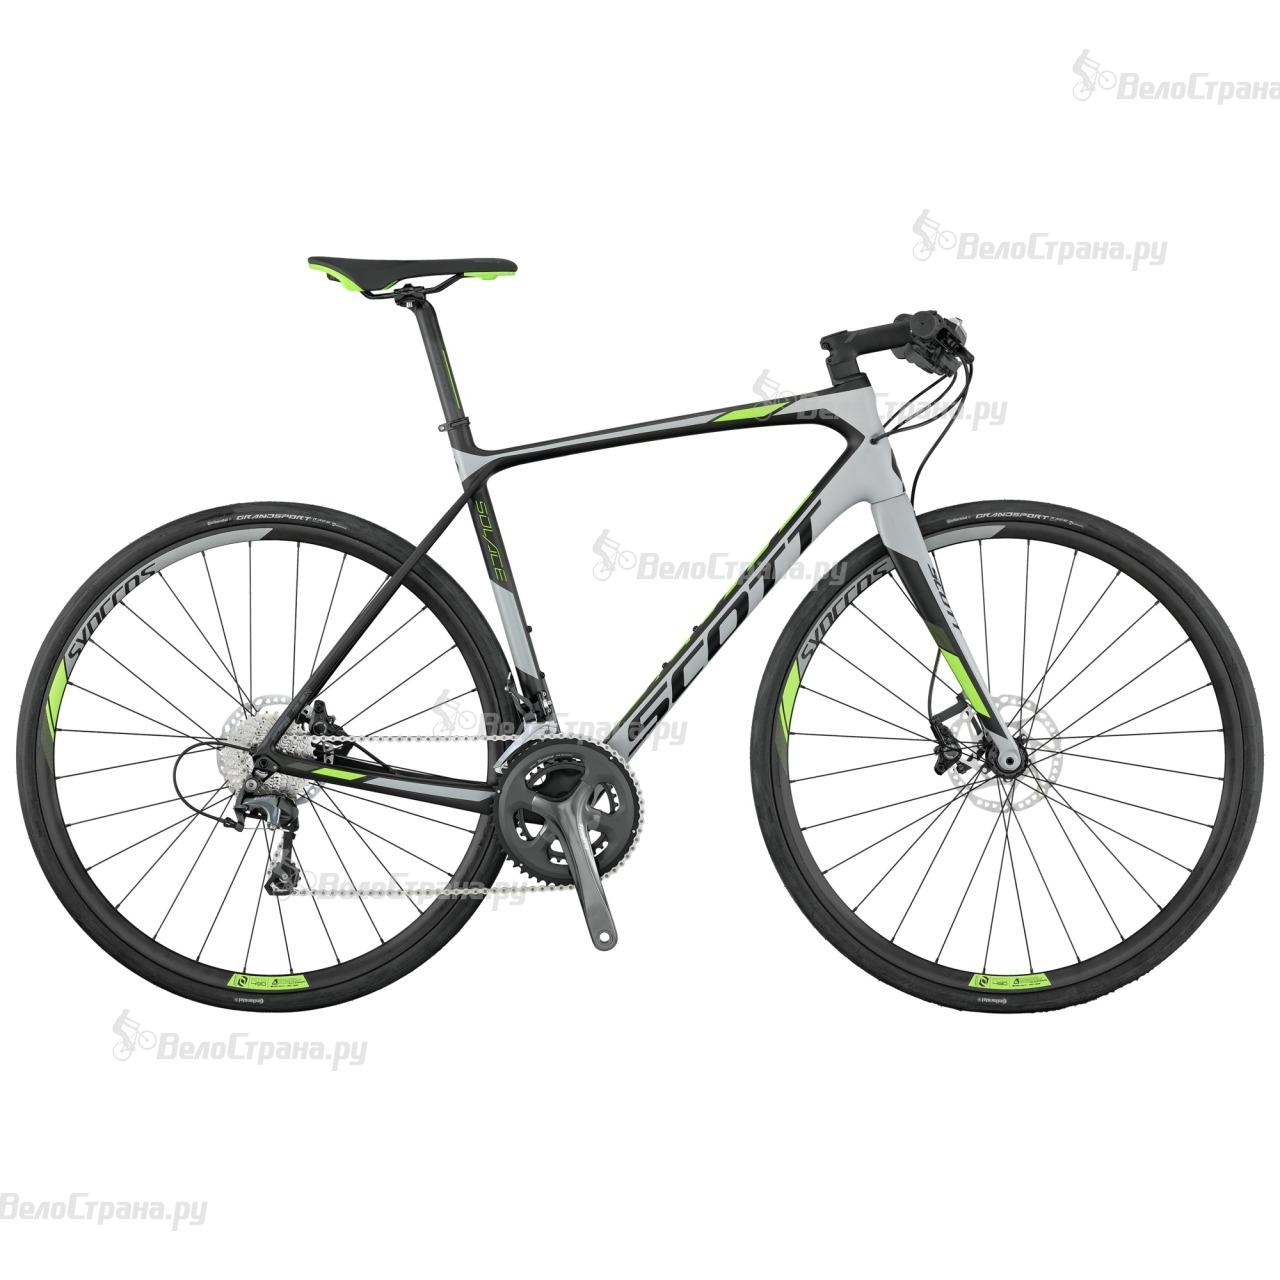 Велосипед Scott Solace 30 FB Disc (2017) велосипед scott contessa solace 15 disc 2017